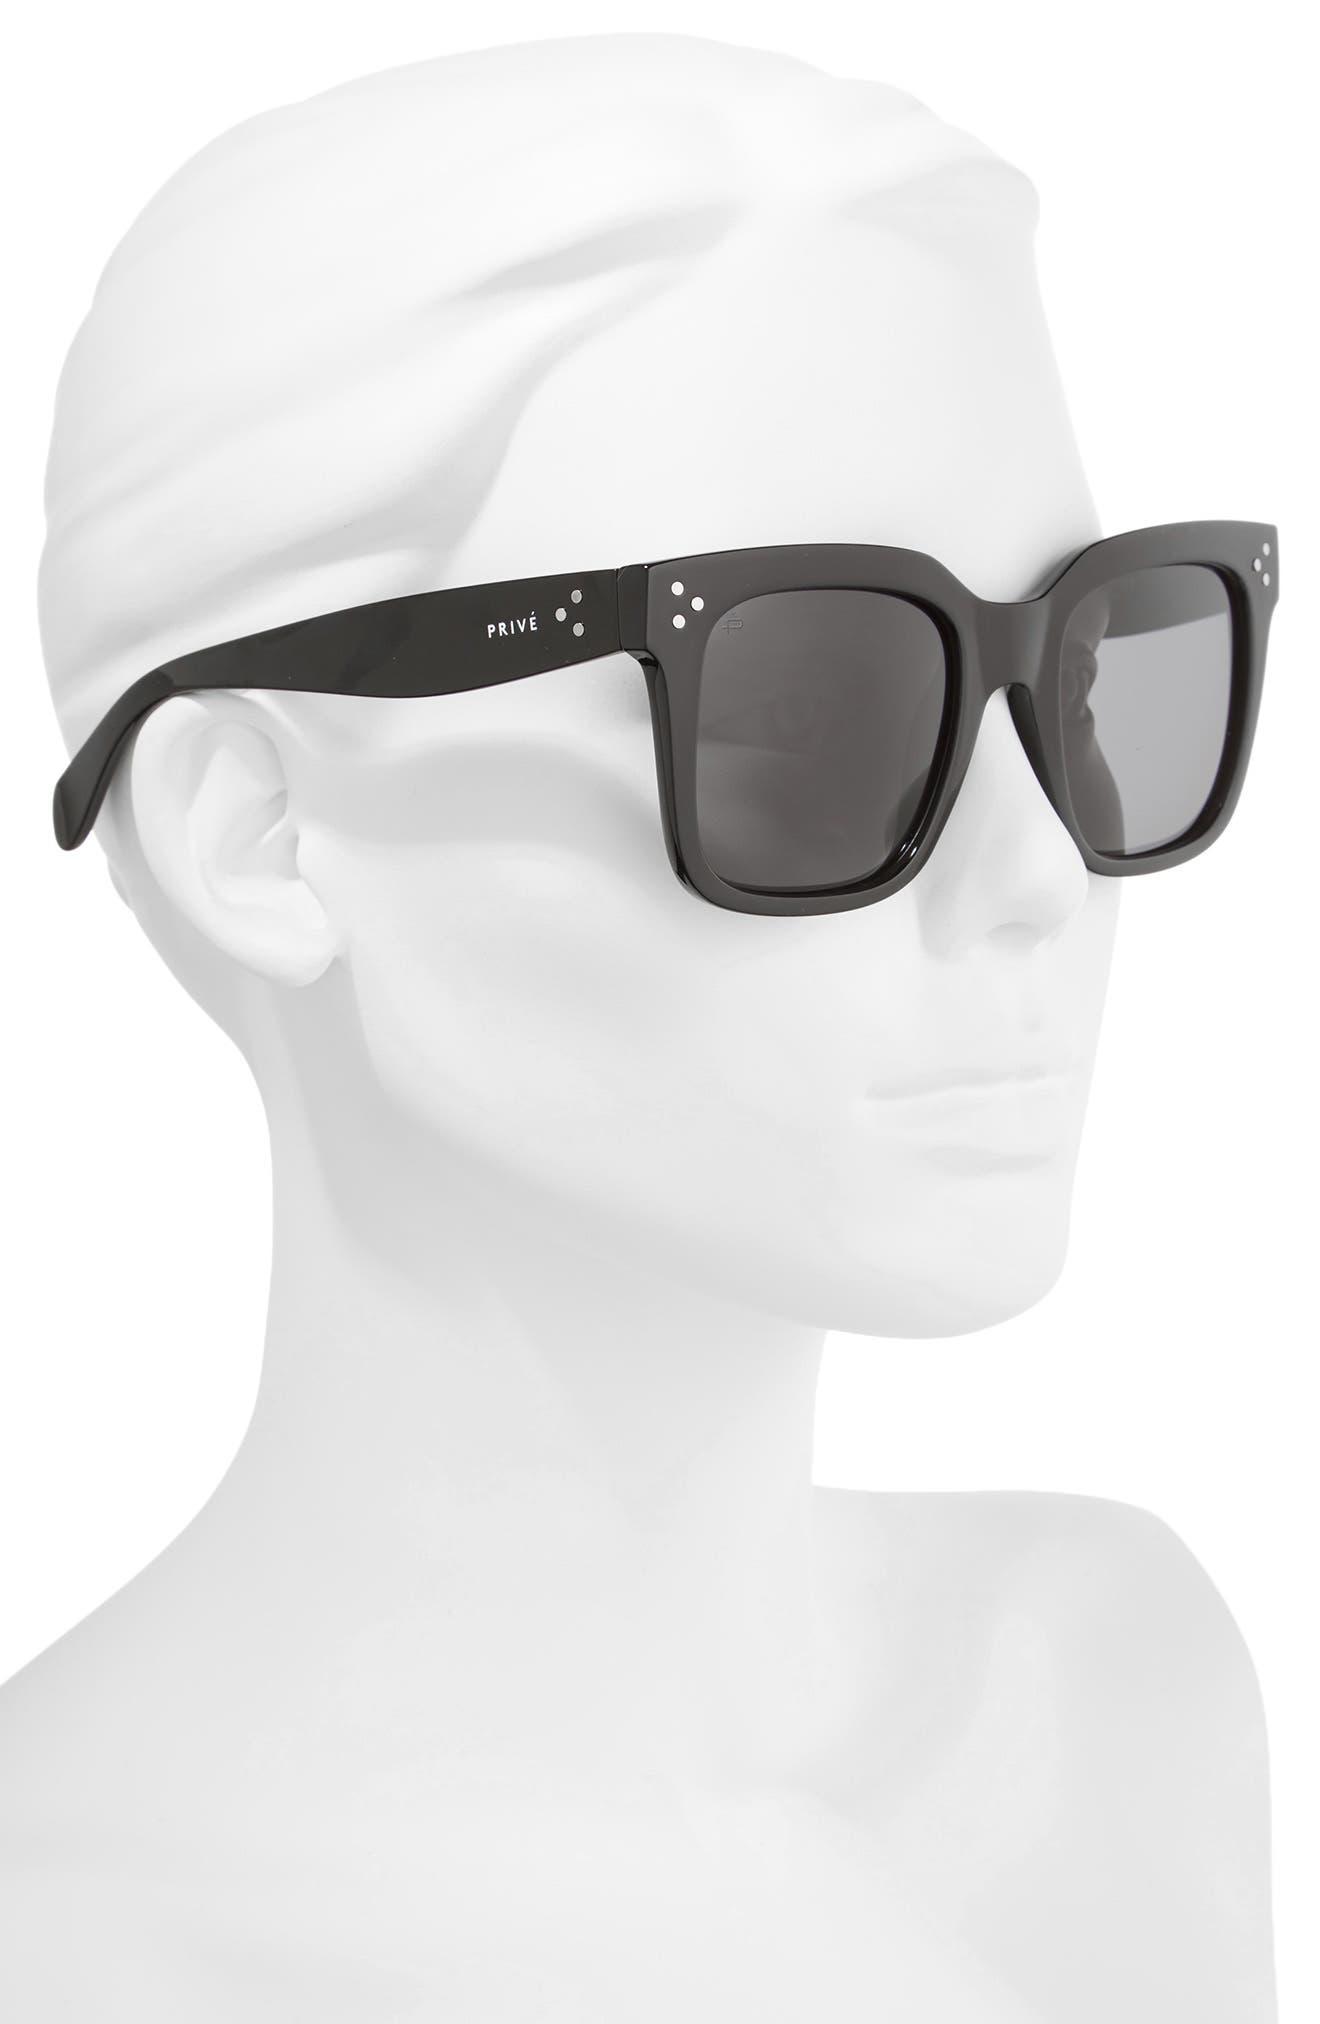 Privé Revaux The Heroine 53mm Sunglasses,                             Alternate thumbnail 2, color,                             Black